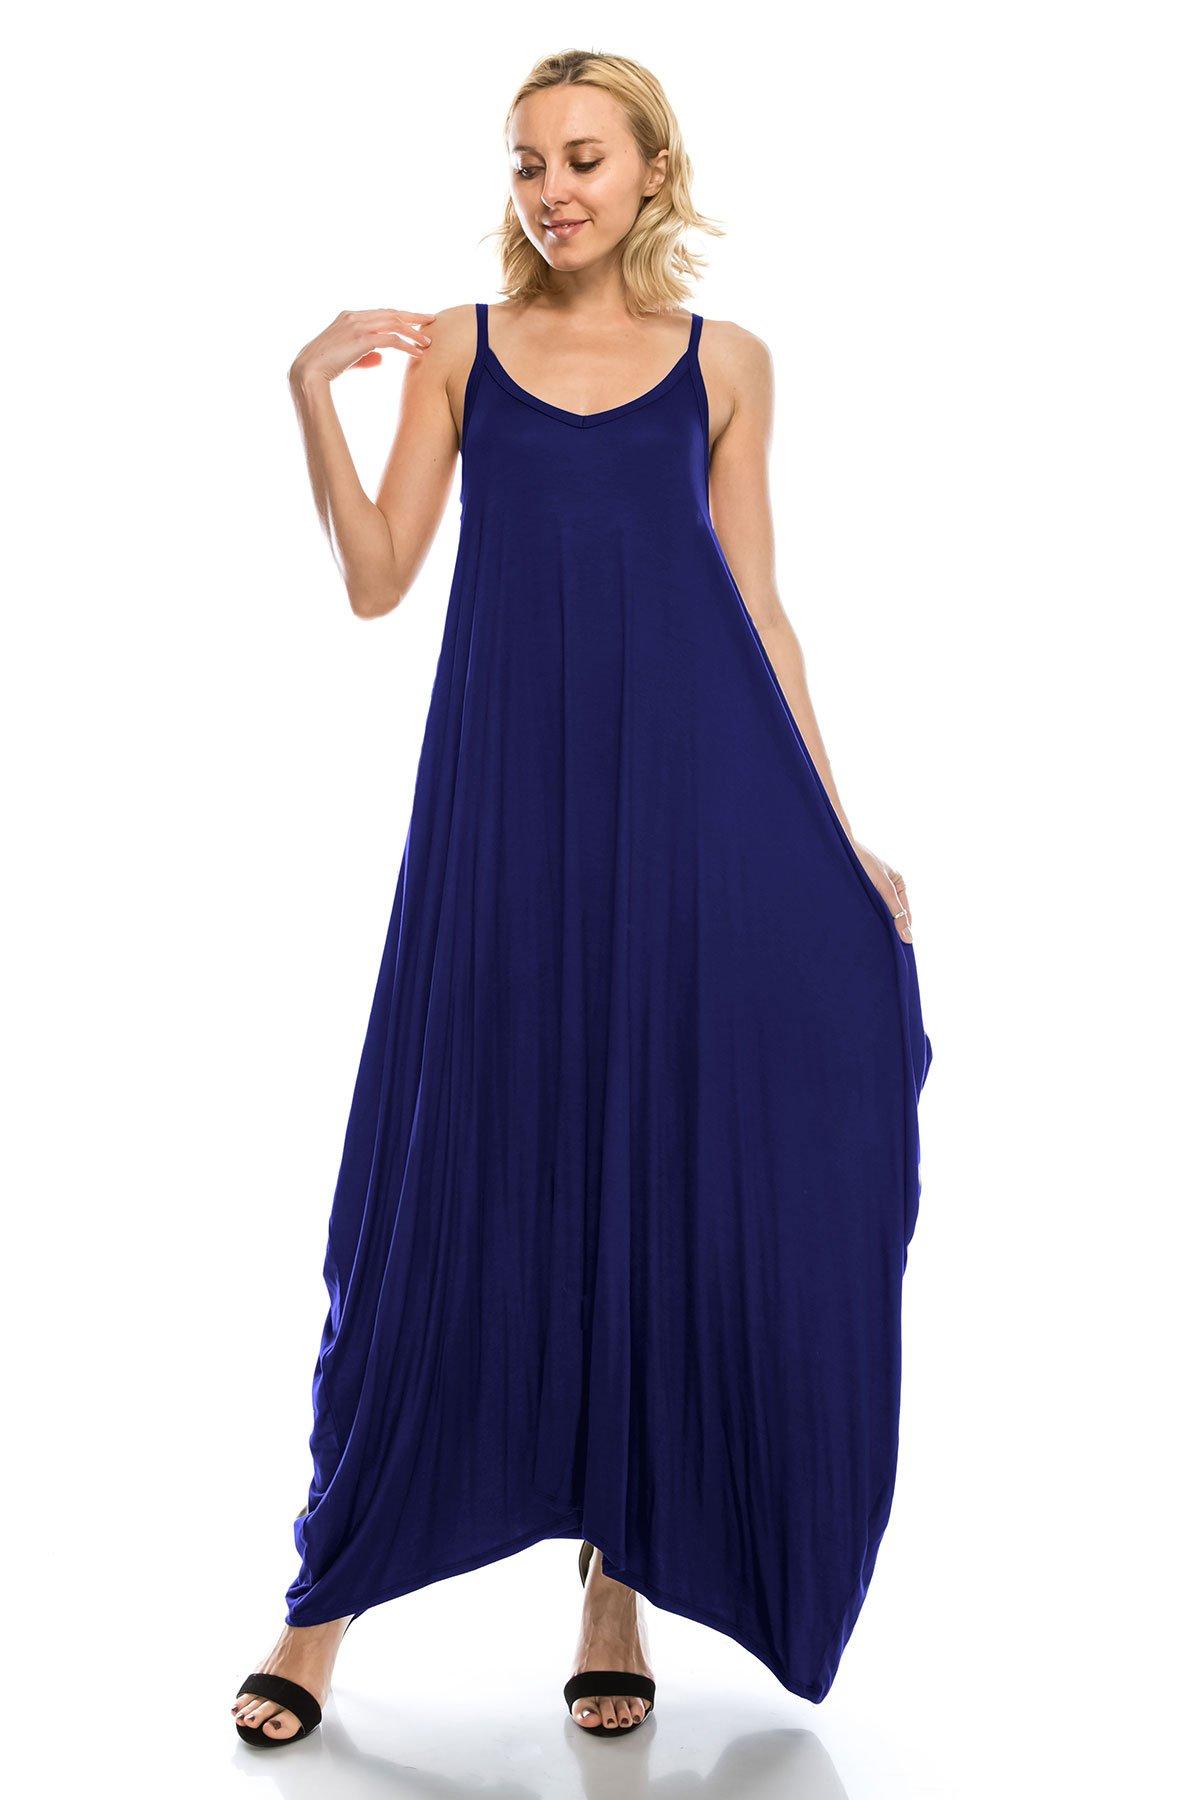 J Doe Style Women's Solid Loose Fit Harem Boho Spagetti Strap Maxi Full Dress(Size :S-5X), 5X, Navy by J Doe Style